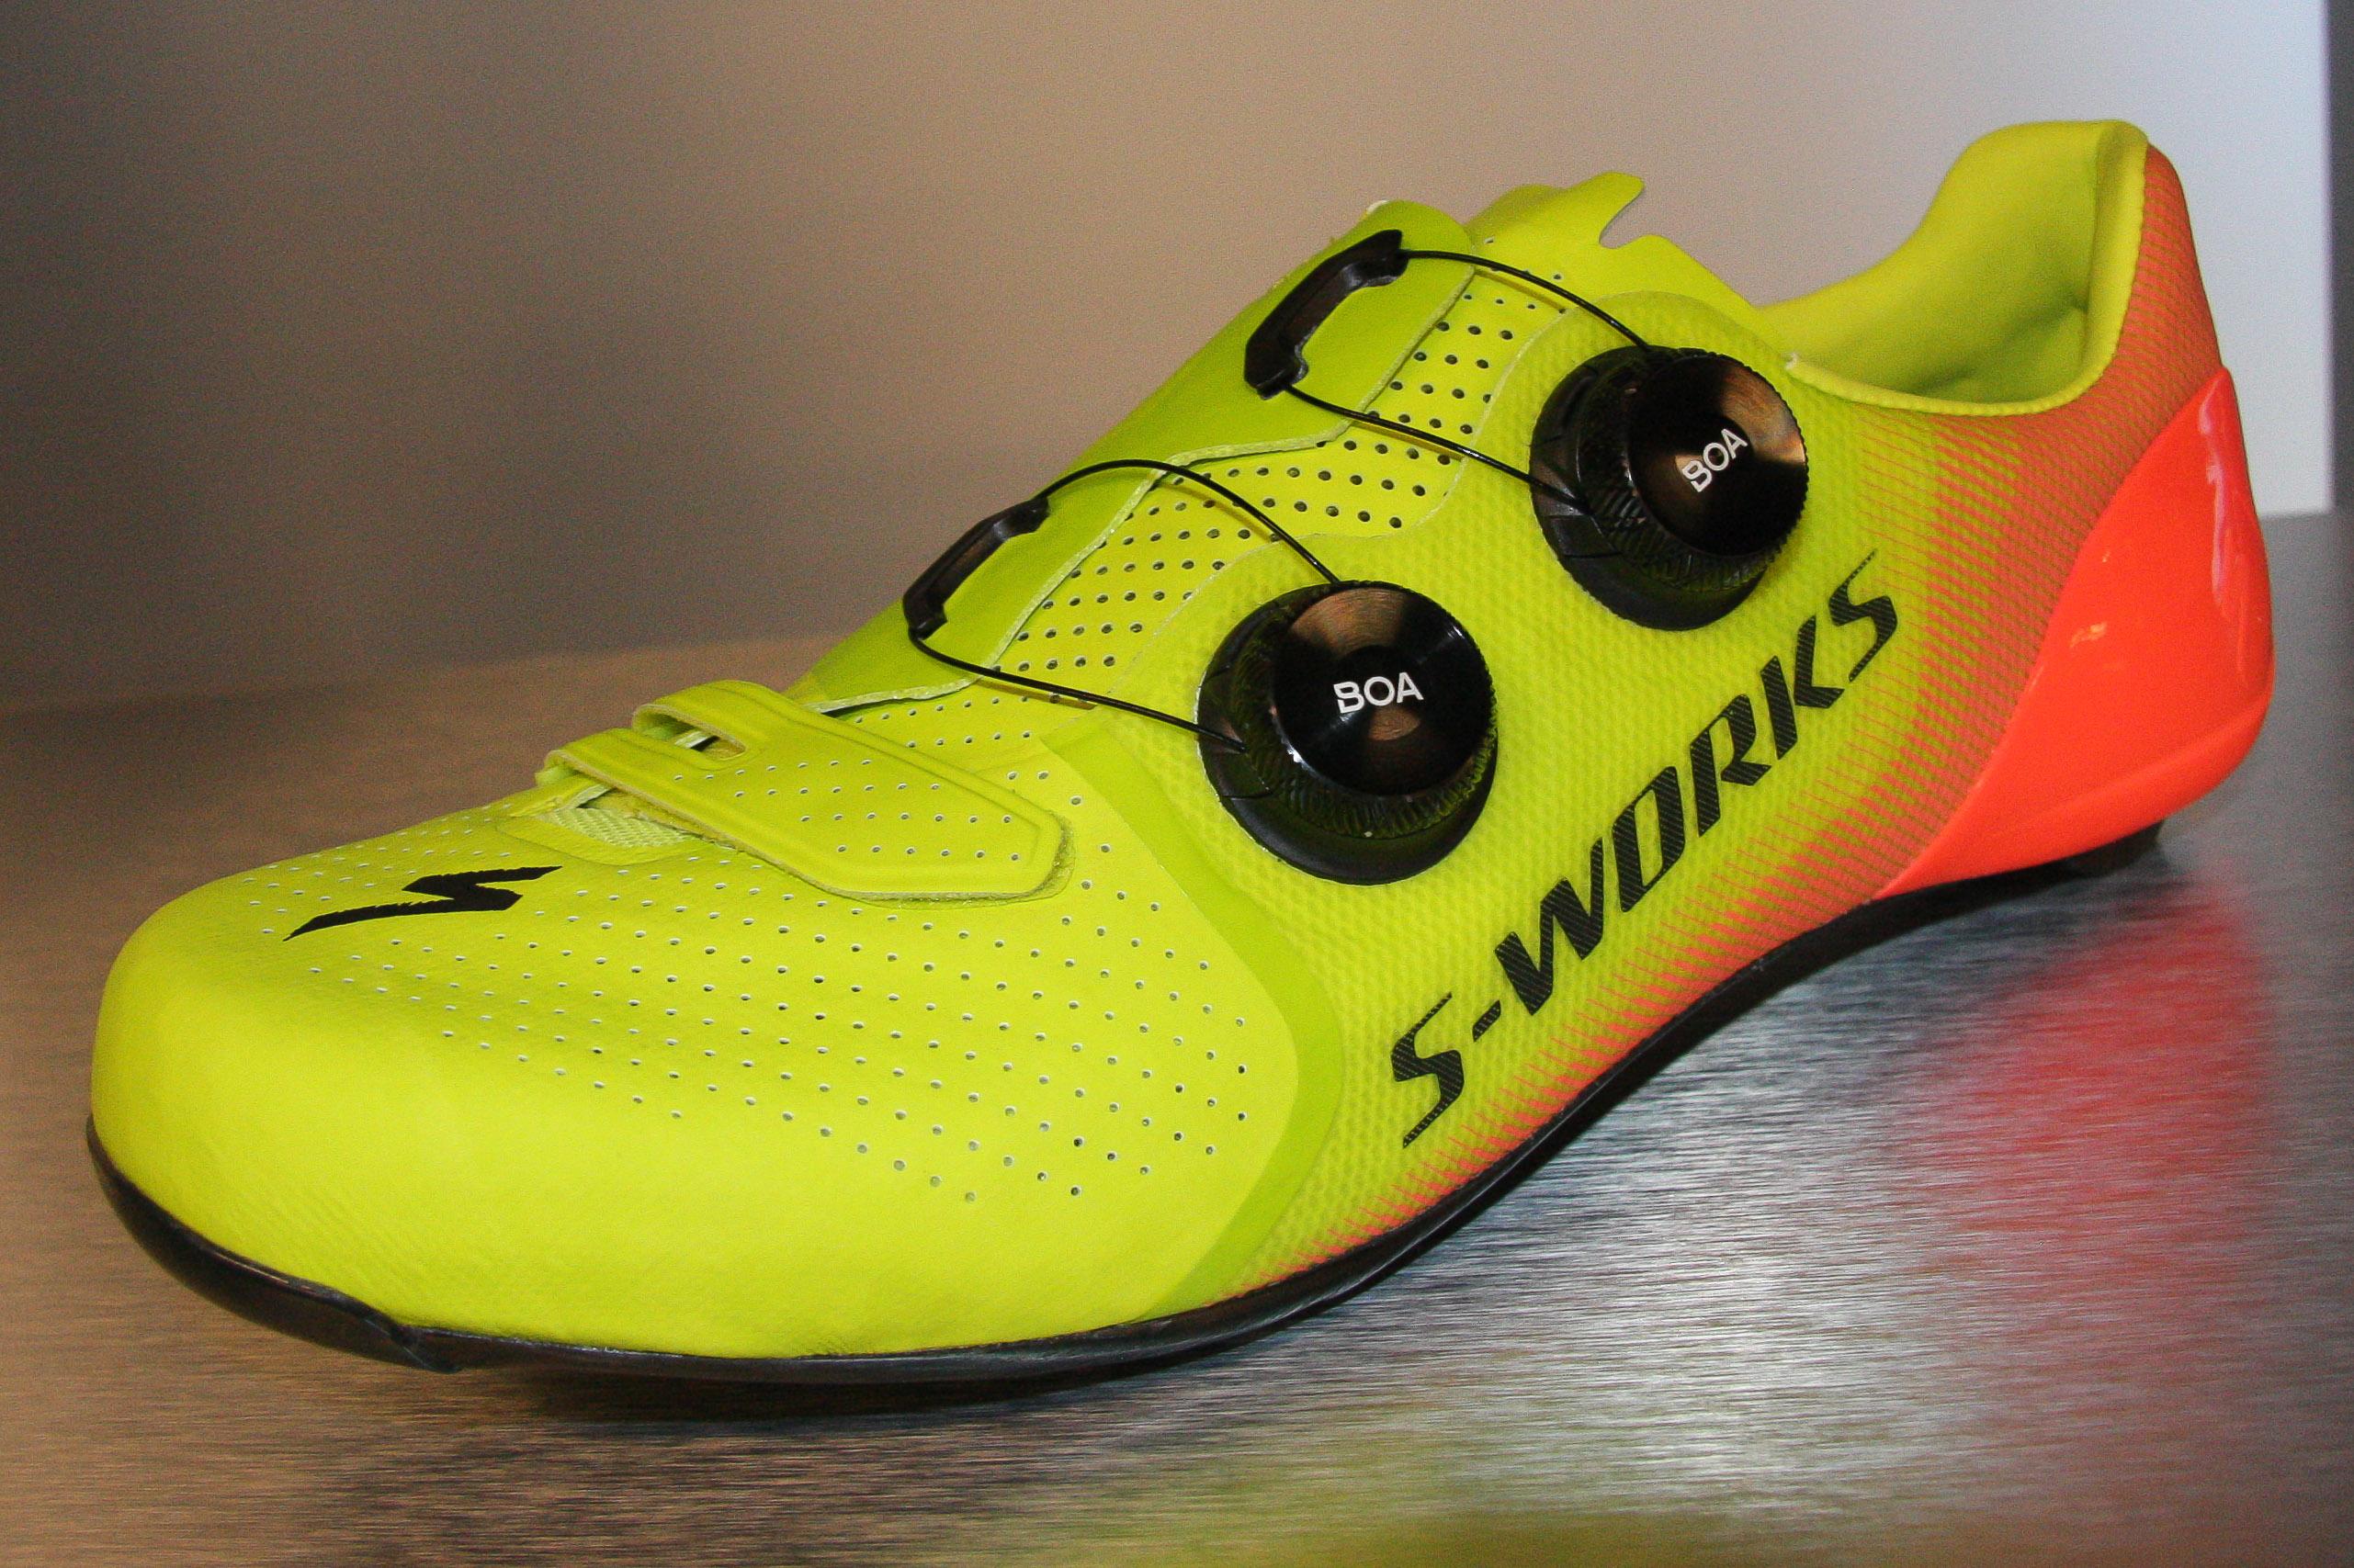 Specialized S-Works 7 Shoe